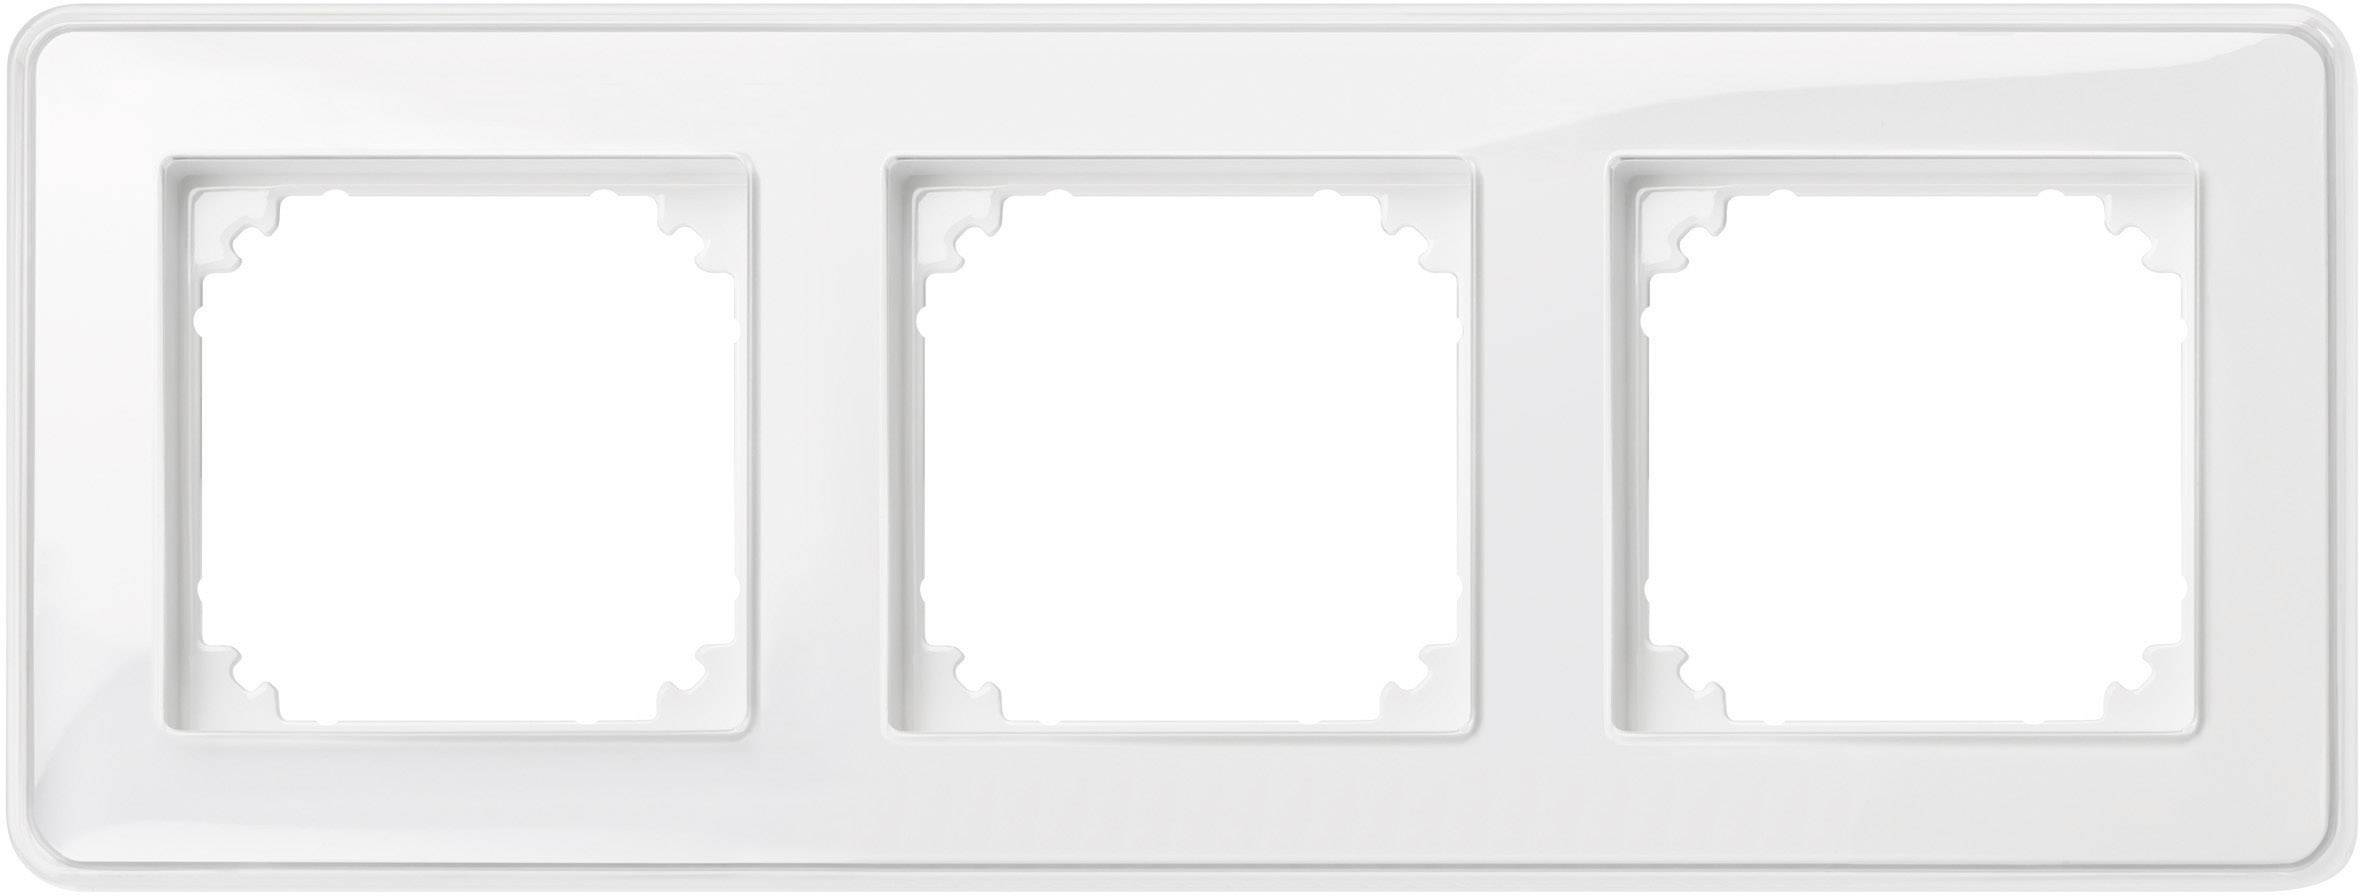 Rámeček 3násobný Merten M-Creativ, polární bílá (MEG4030-3500)